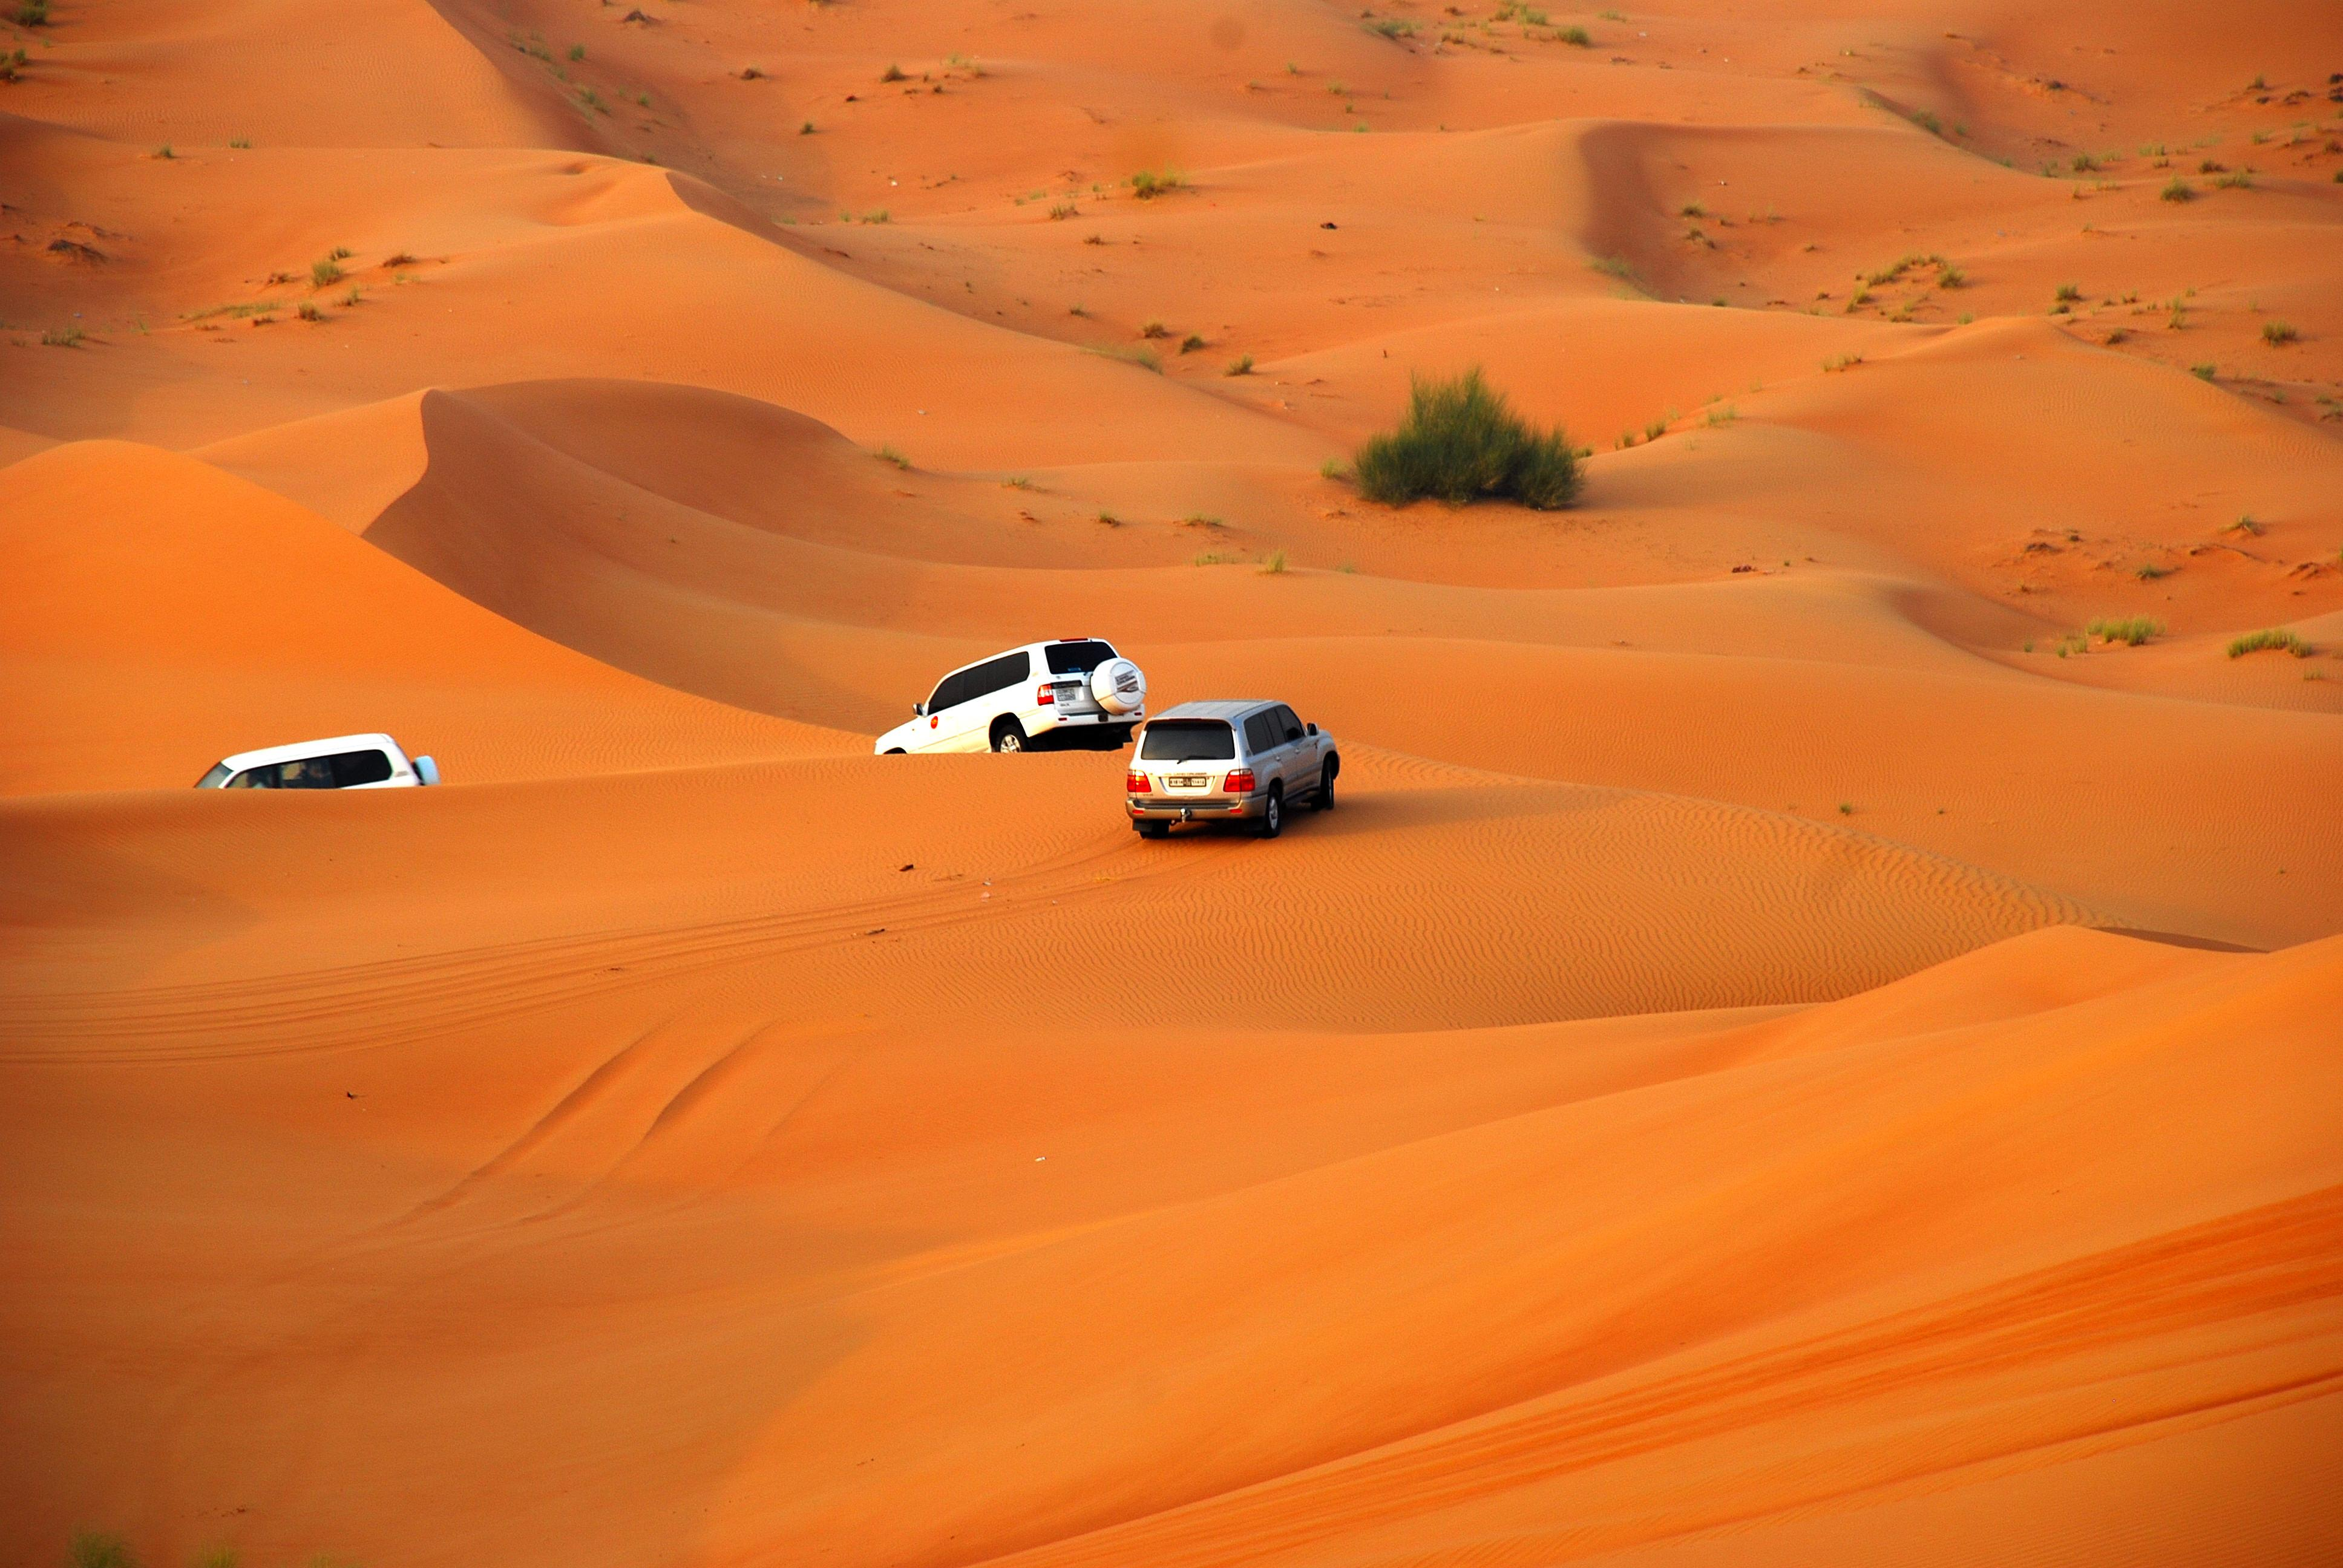 Dubai Desert Safari - Dune Bashing